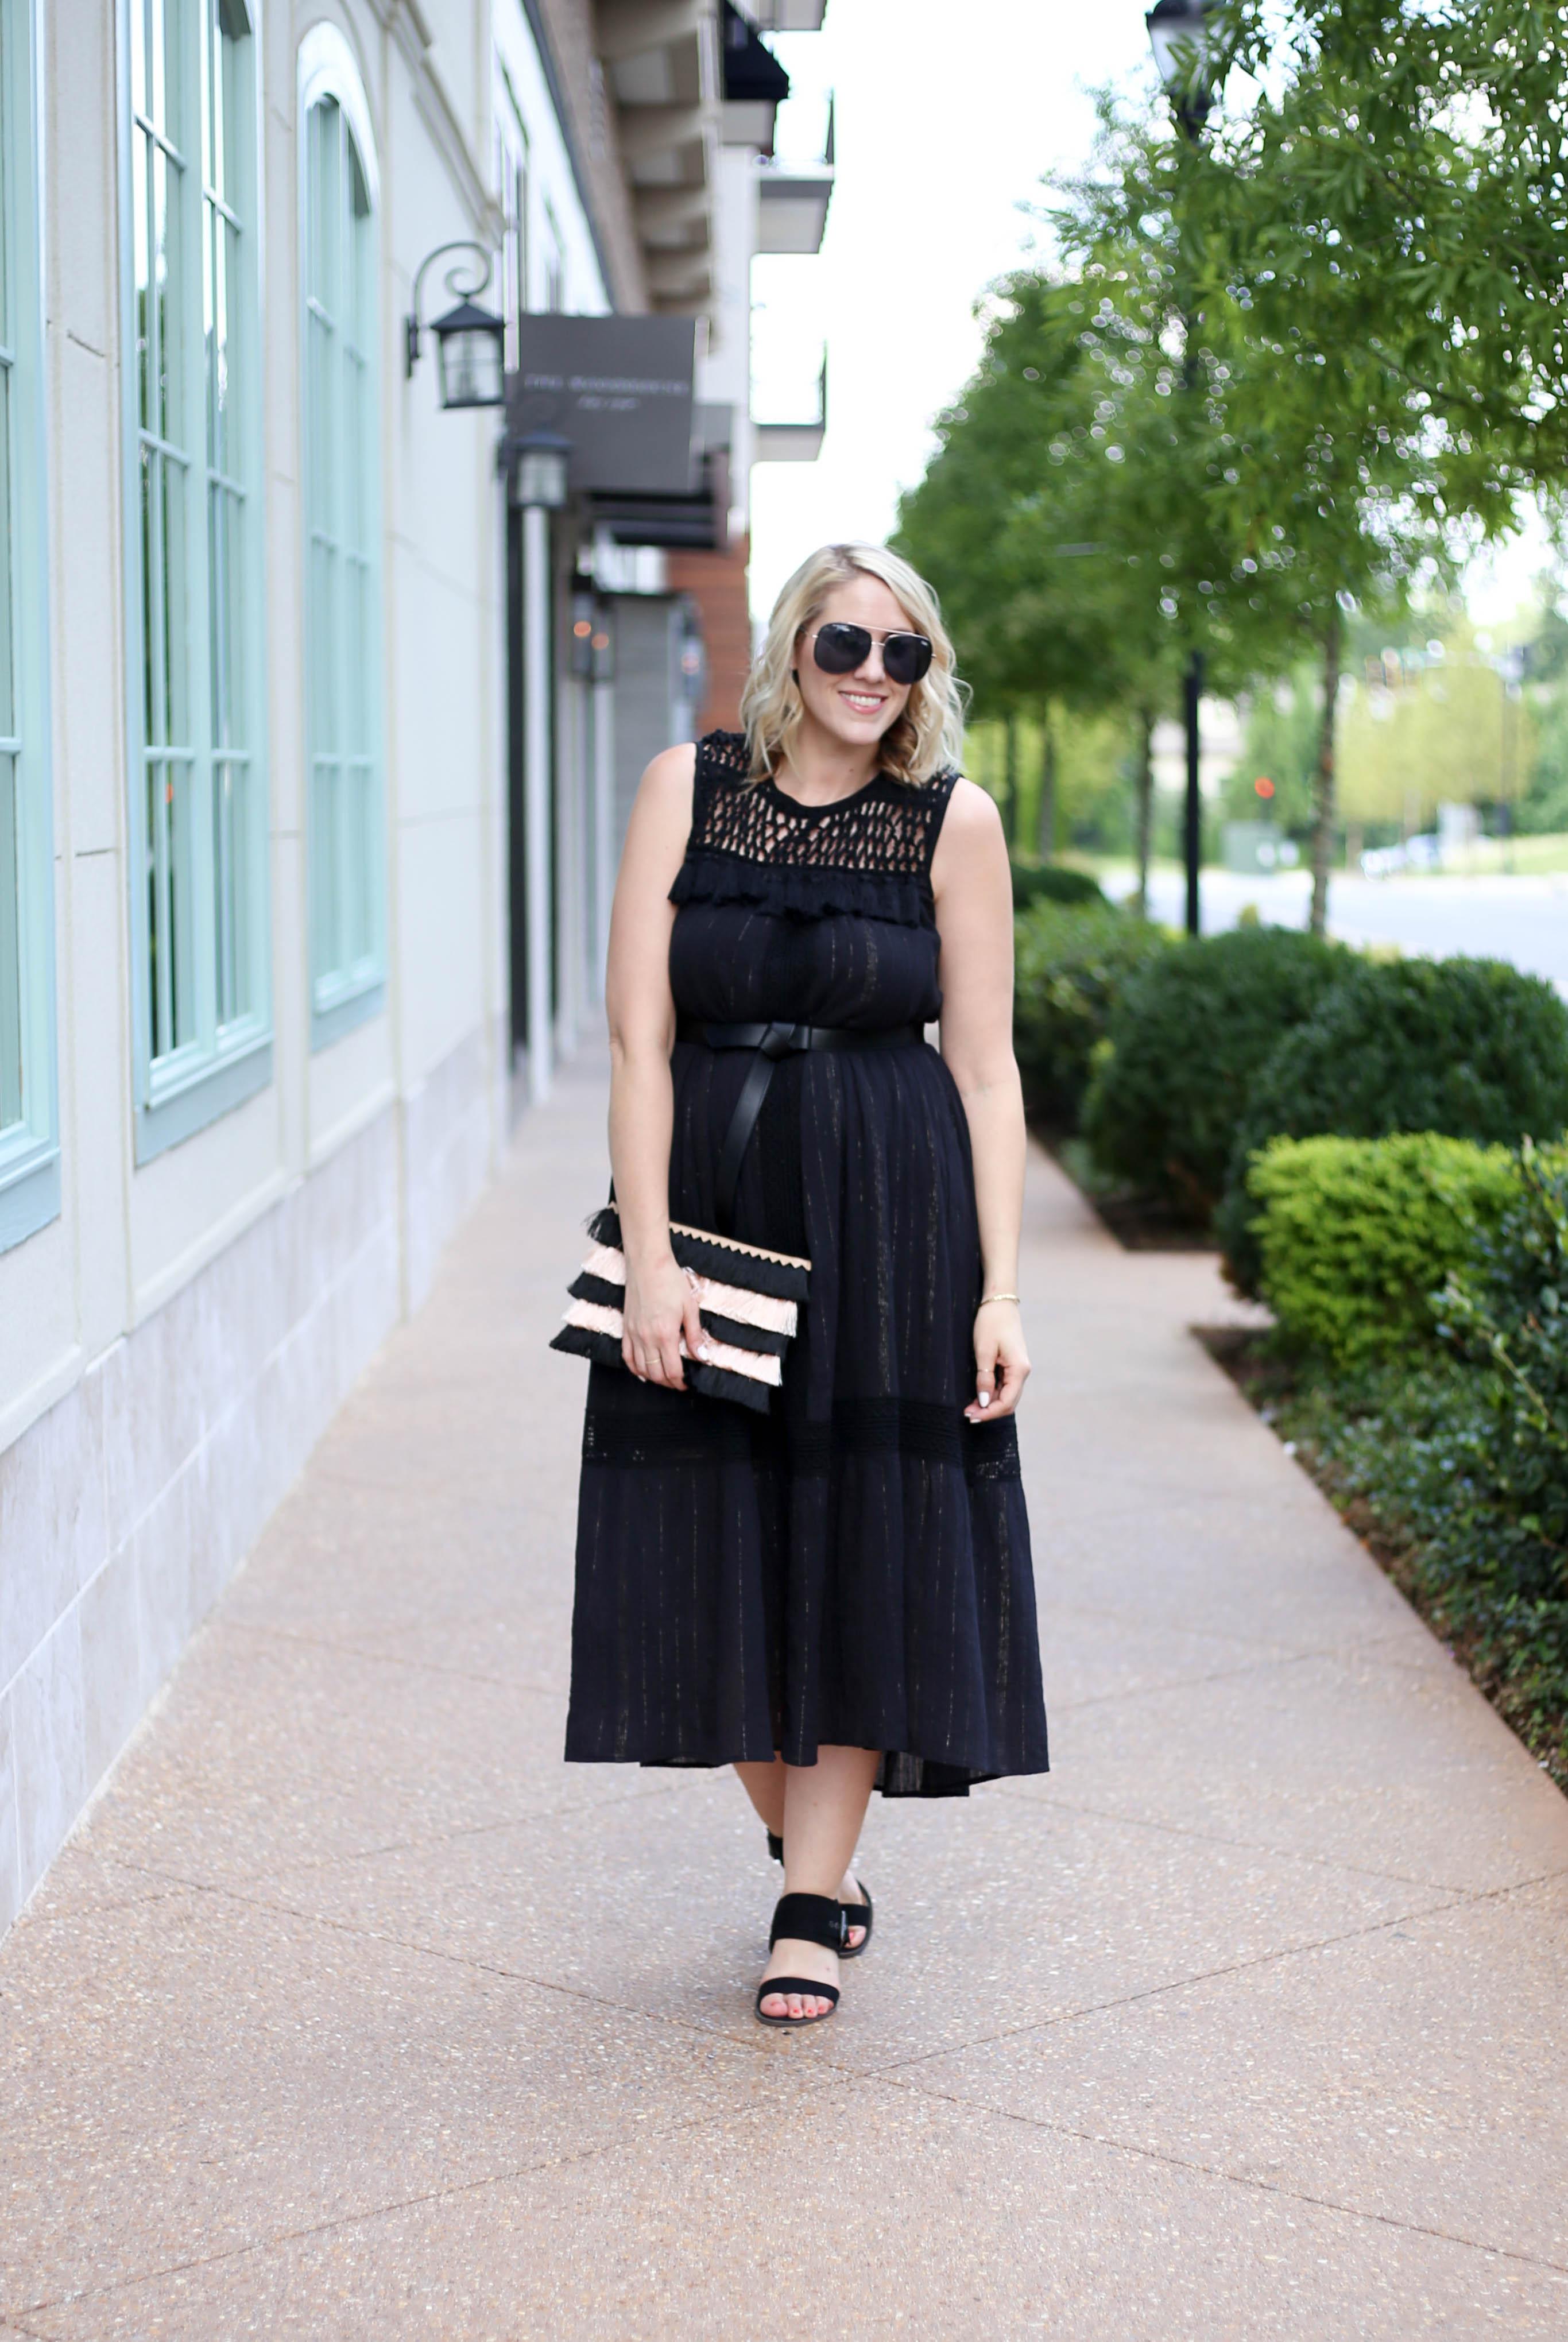 black midi dress boho style #boho #mididress #anthropologie